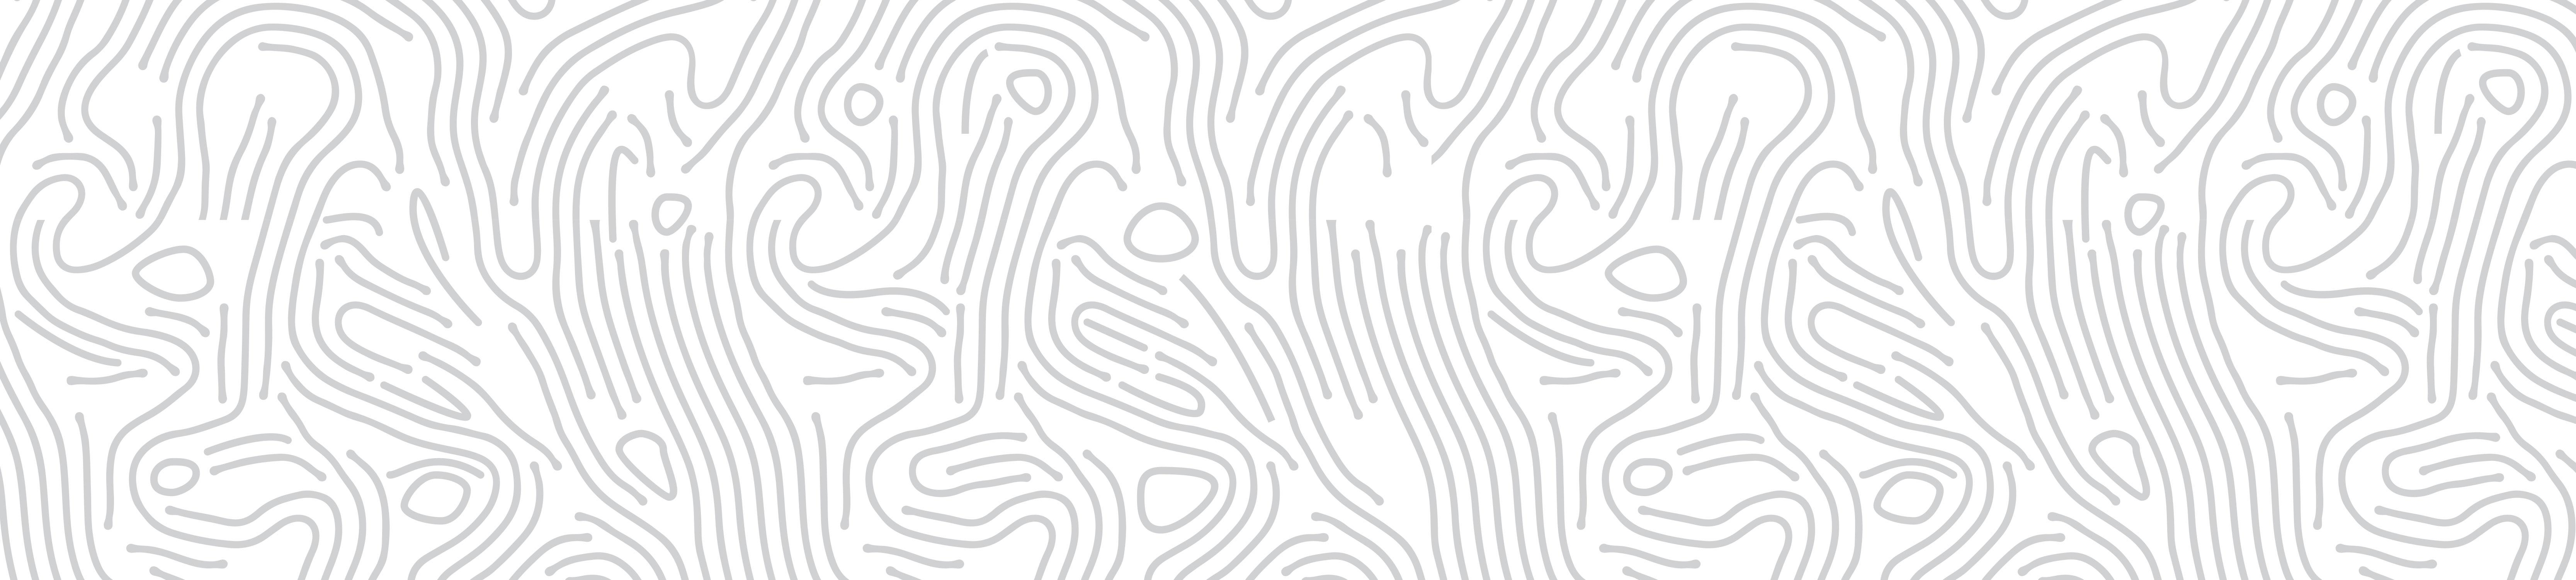 pattern Klipsch Marketing & Advisors